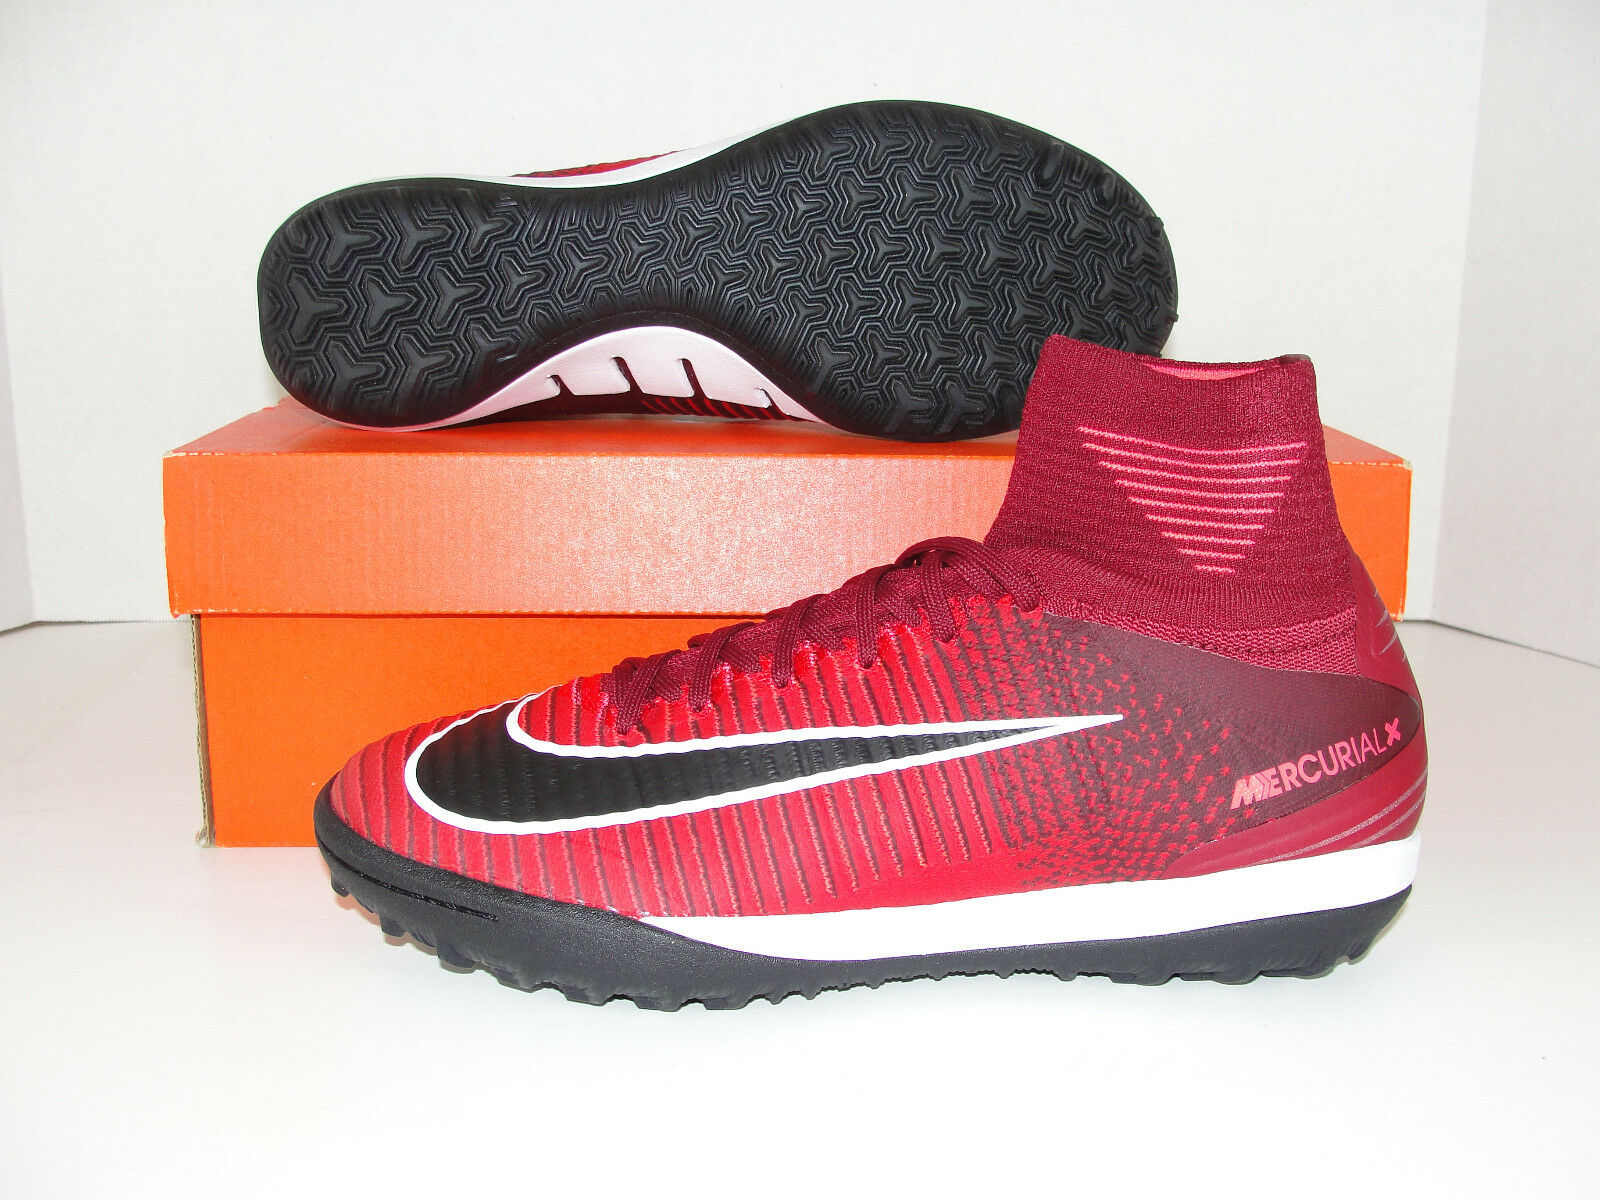 Nike MercurialX Proximi II DF TF Turf Soccer Shoes Red Black 831977-606 Men 7.5